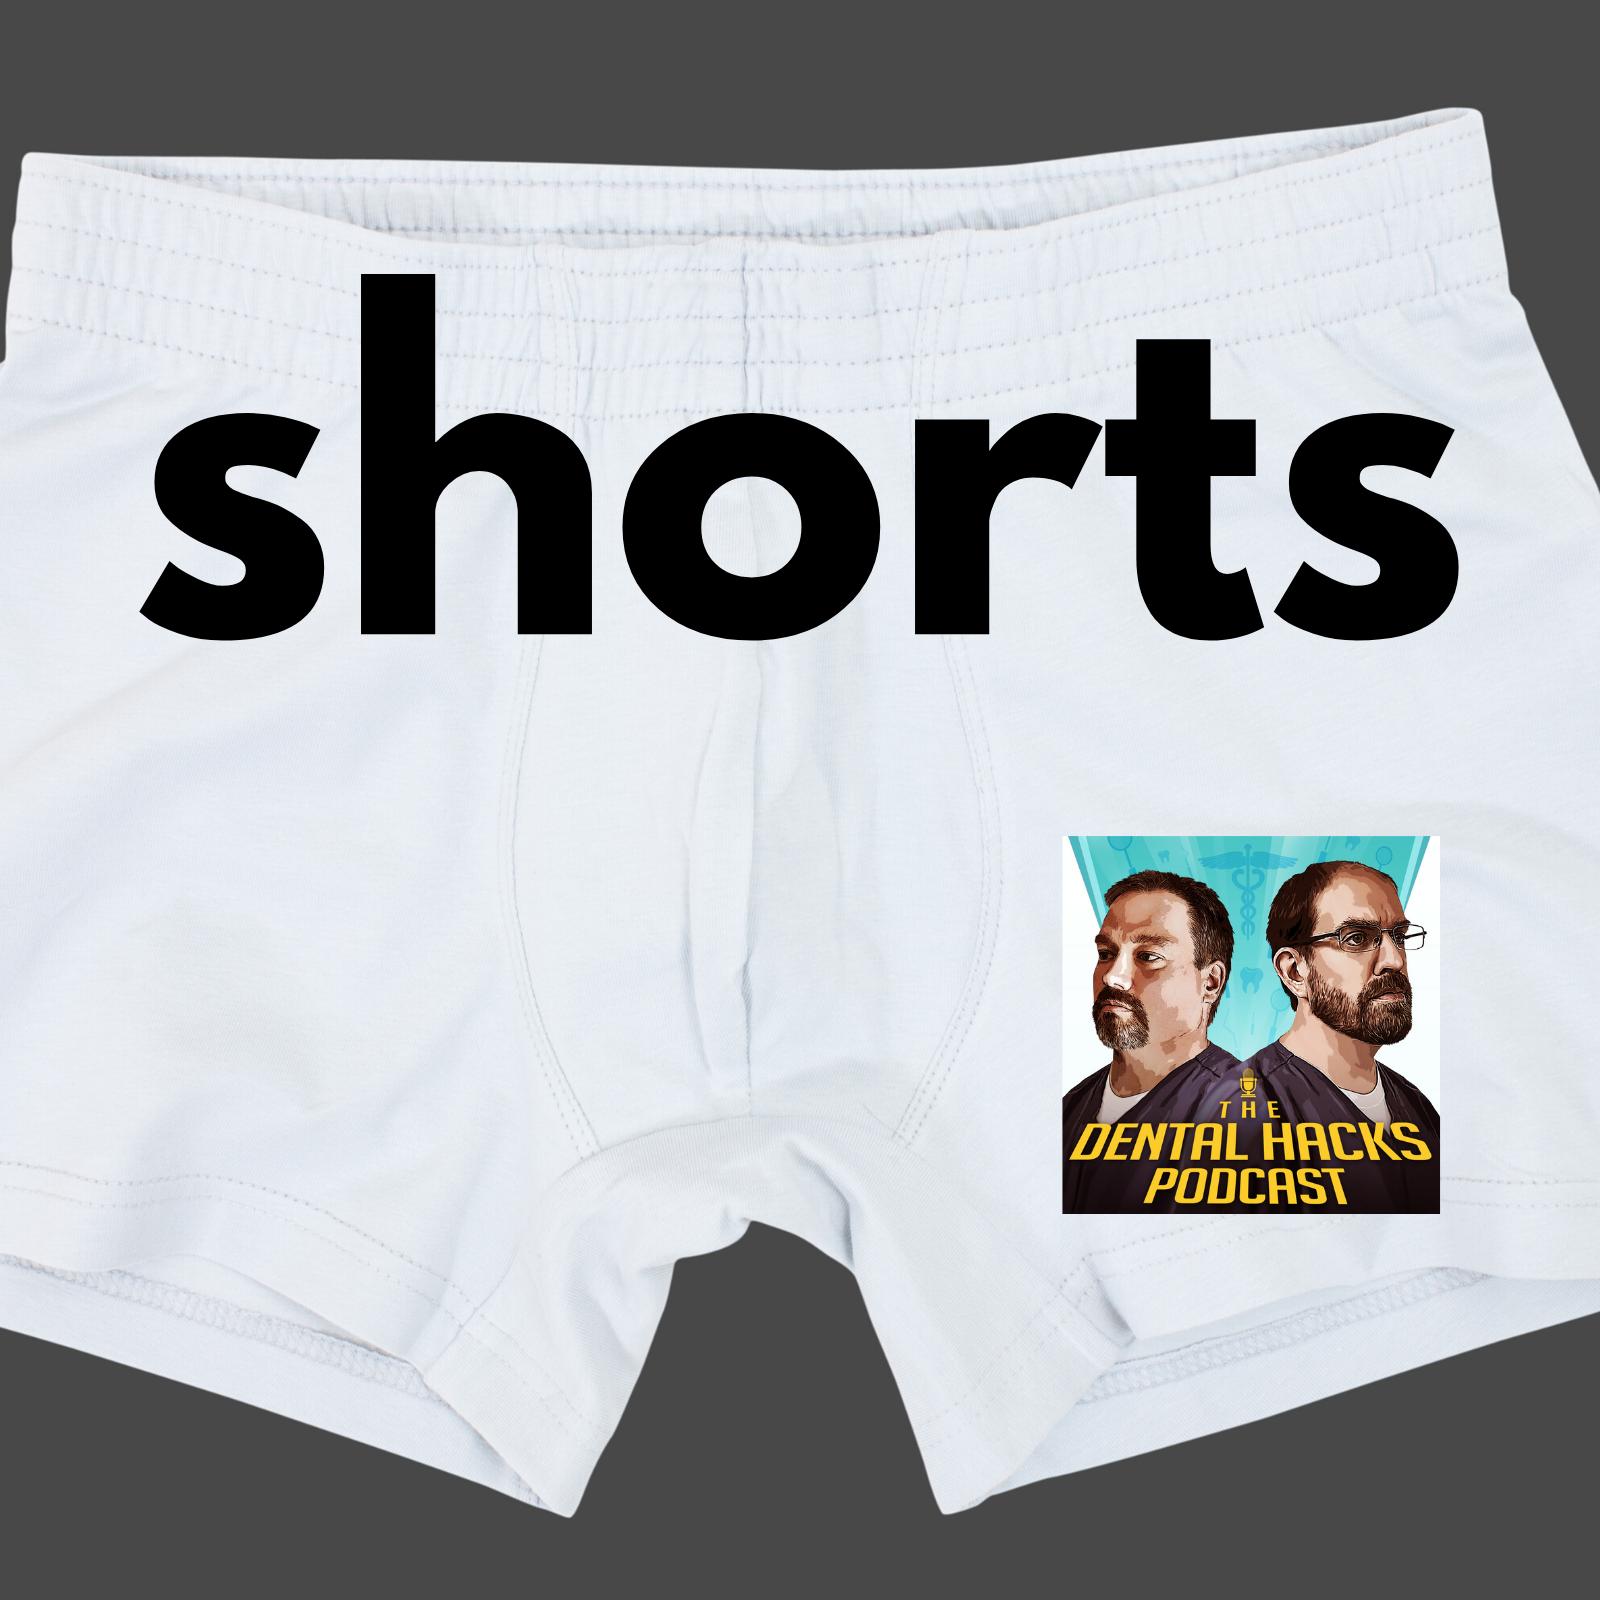 Artwork for Introducing Dental Hacks Shorts